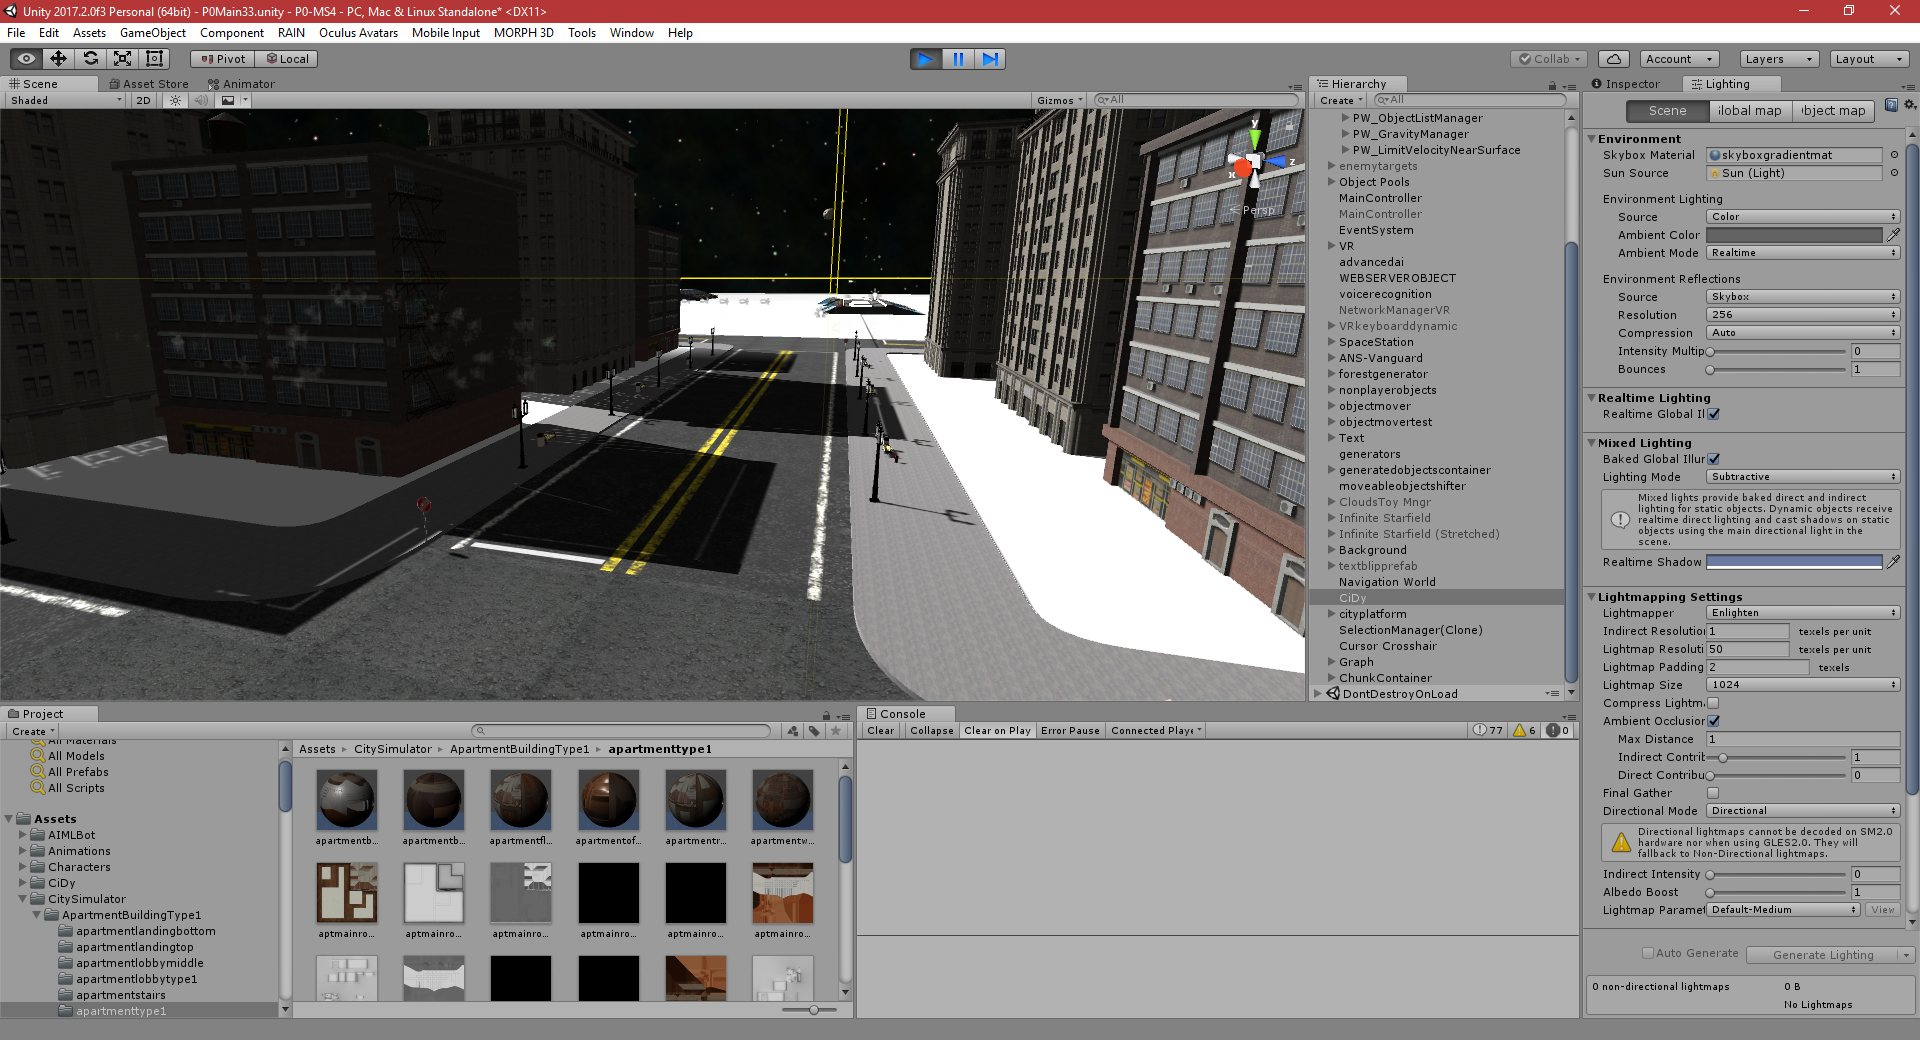 P0-MS5: Part 305: City Simulator - PGD Home